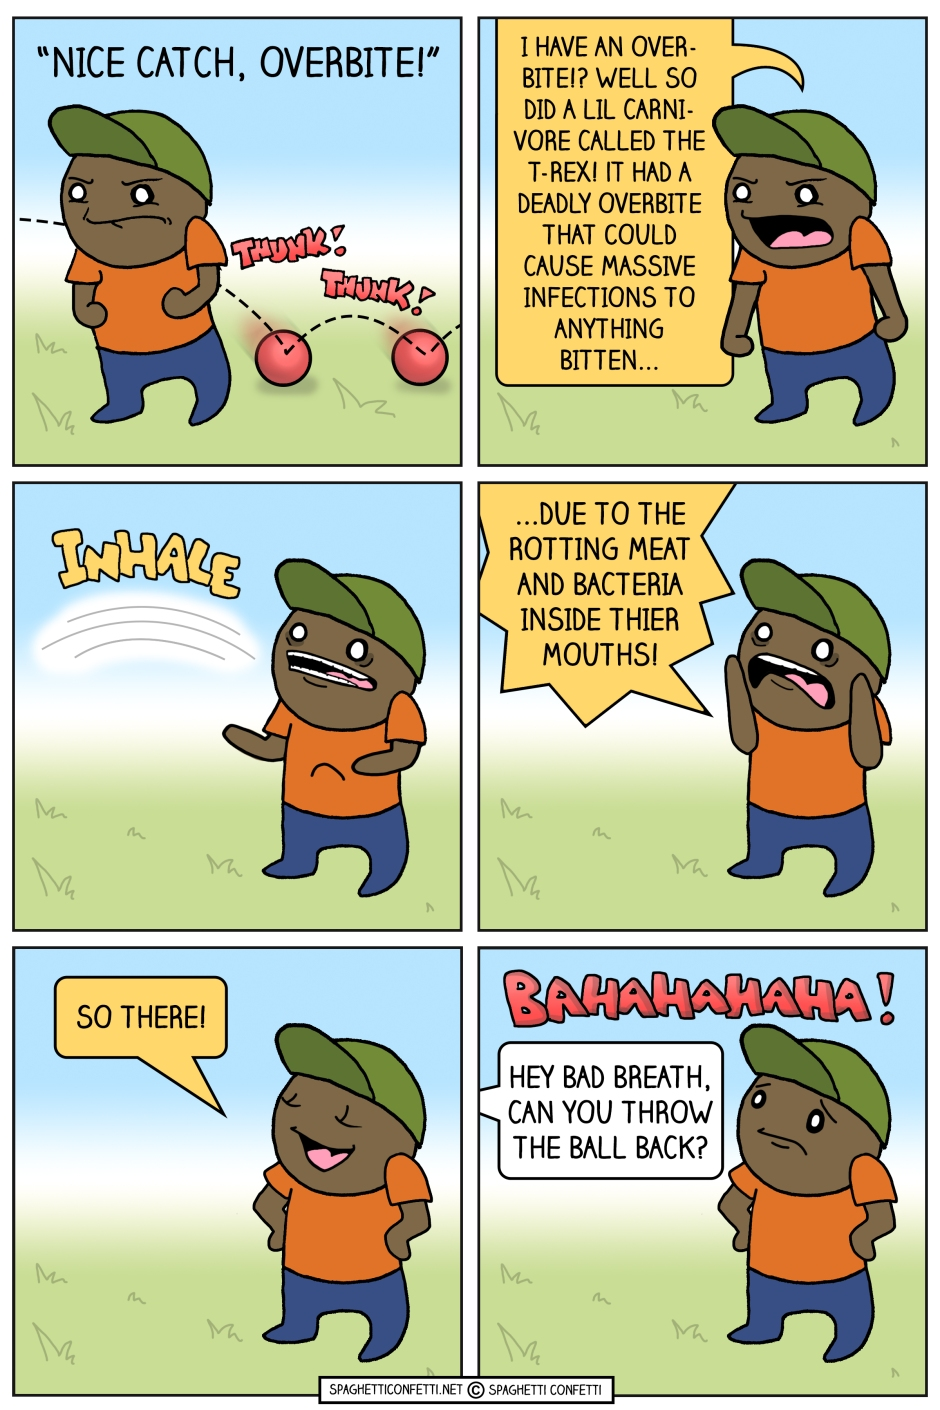 Overbite Comic